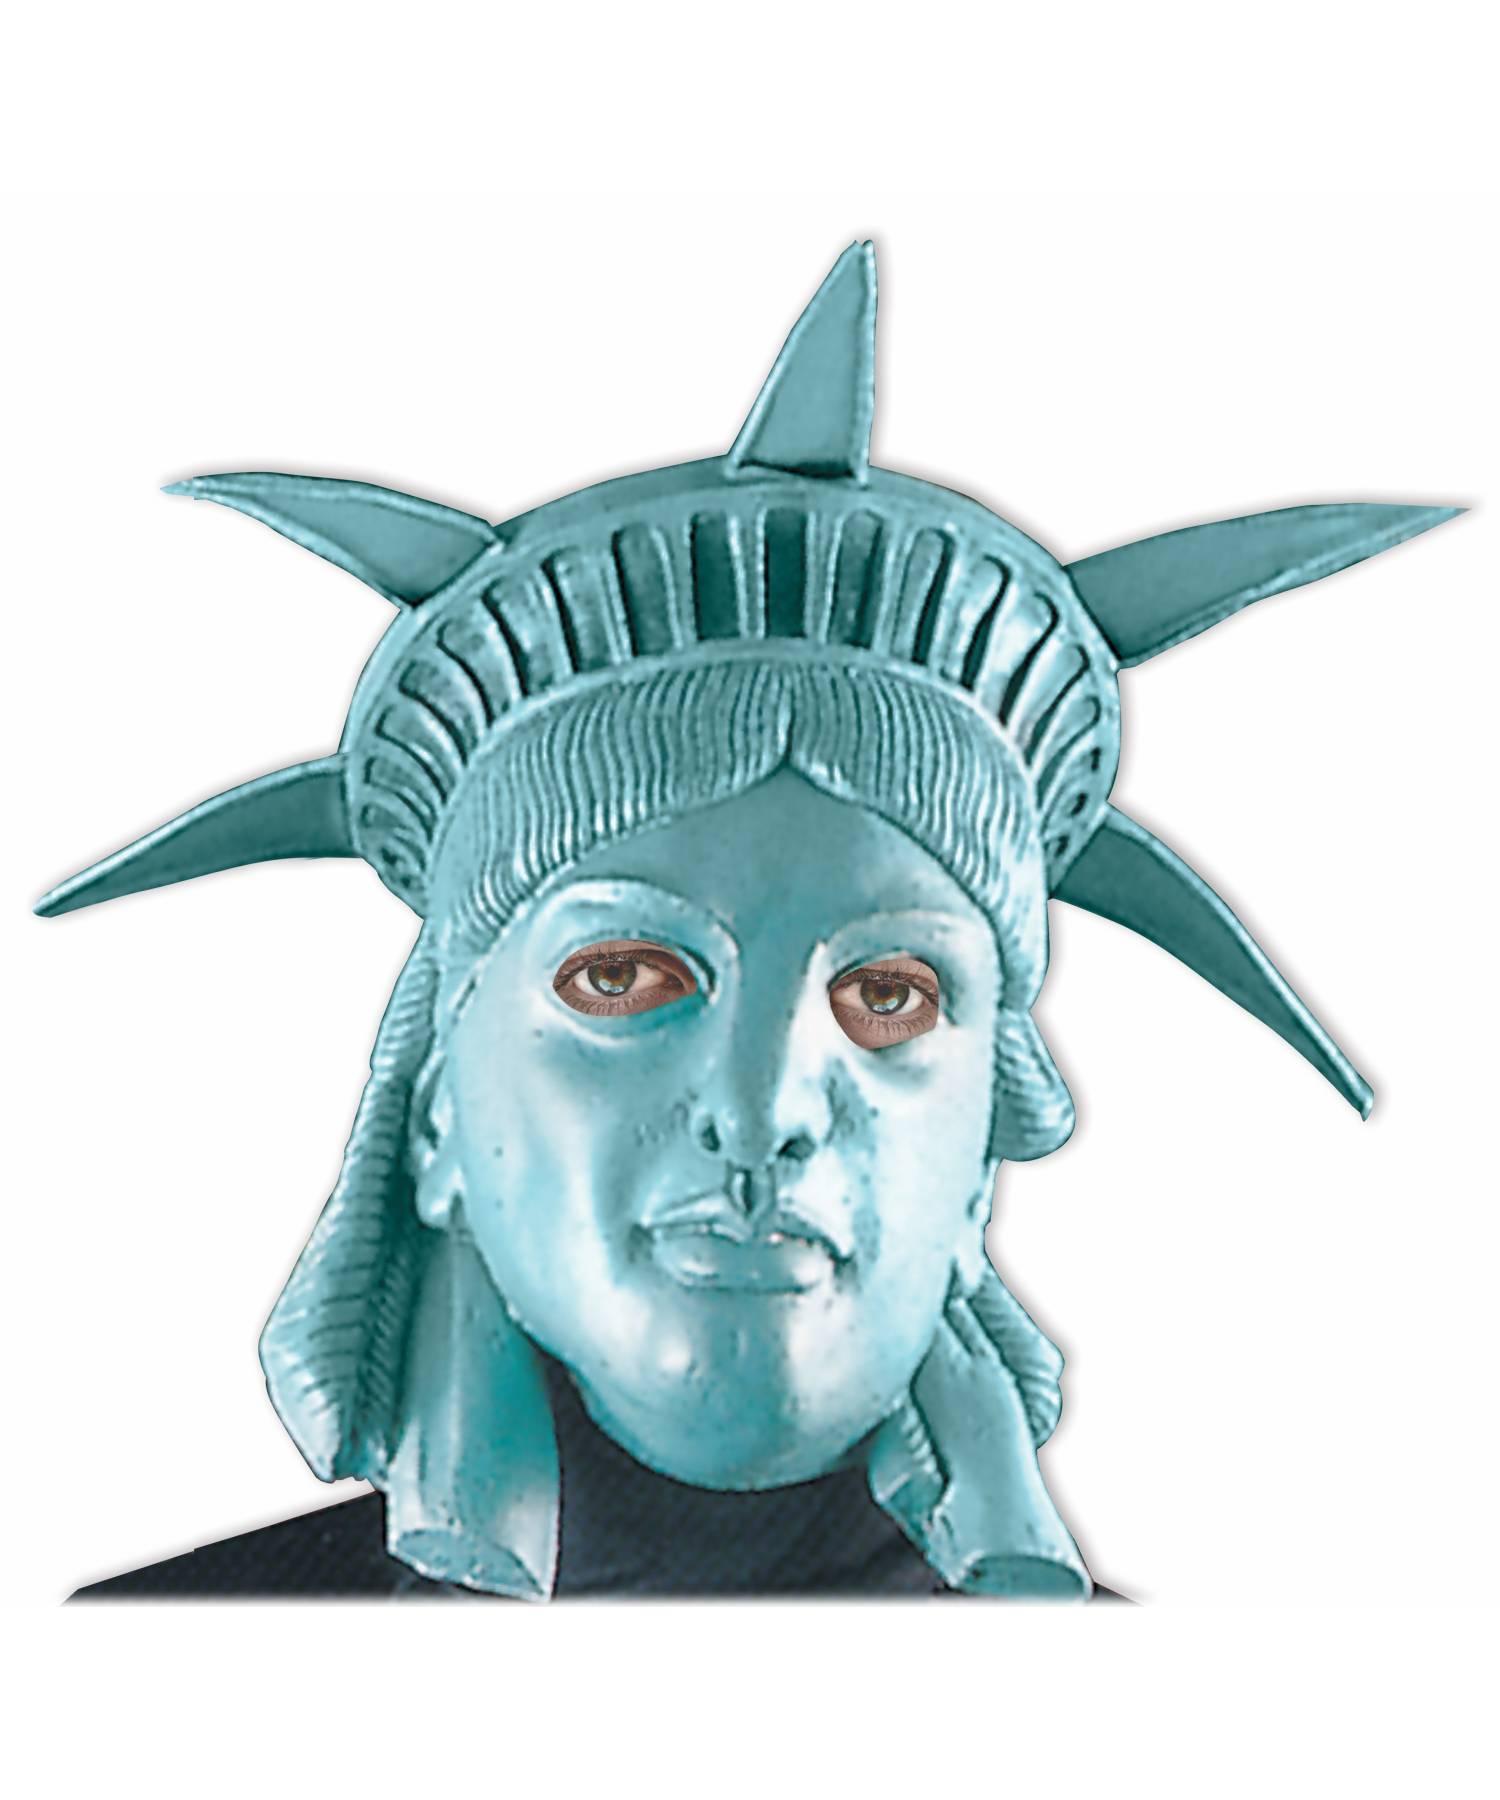 Masque-Statue-de-la-Liberté